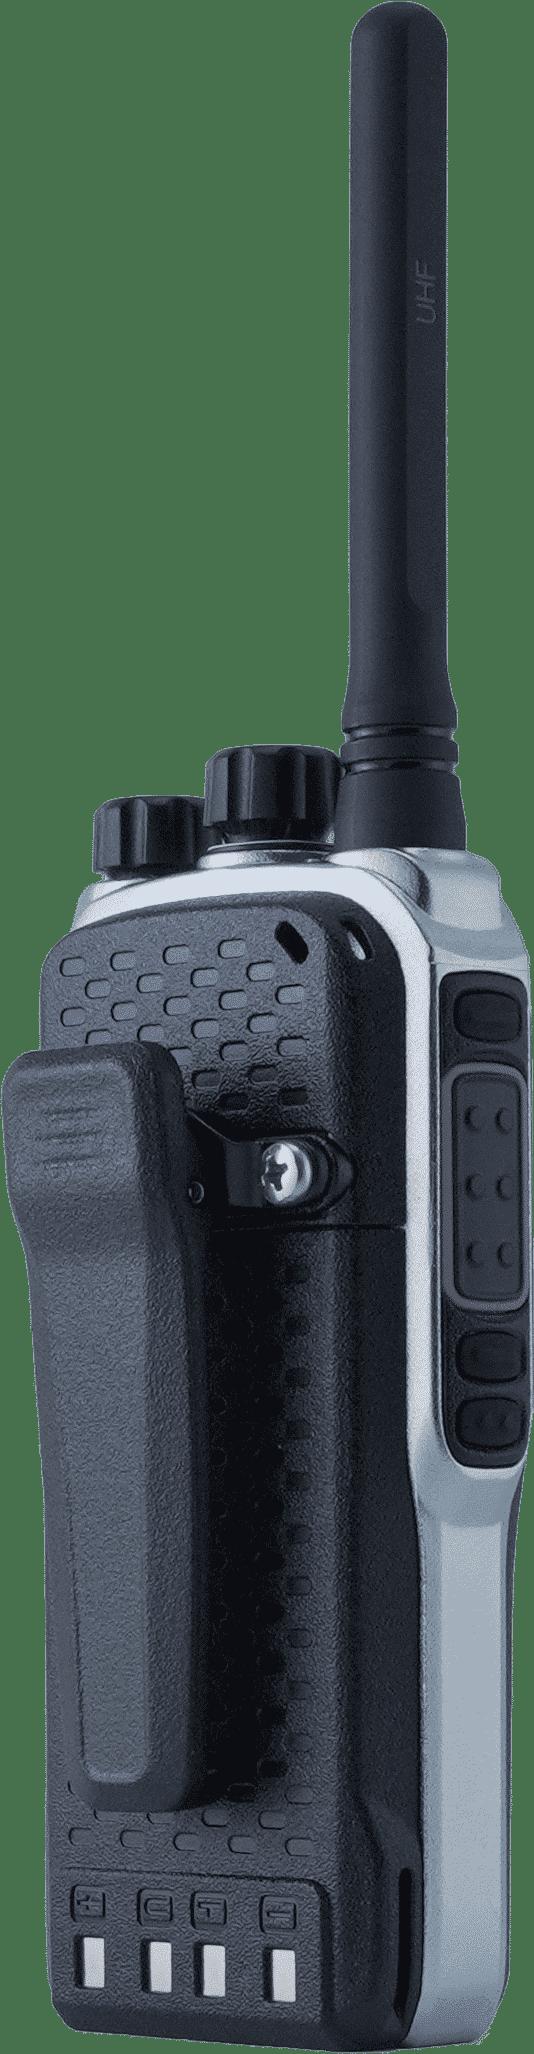 _0004_DigiX-Link-DMR-Digital-Portable-Radio-Back